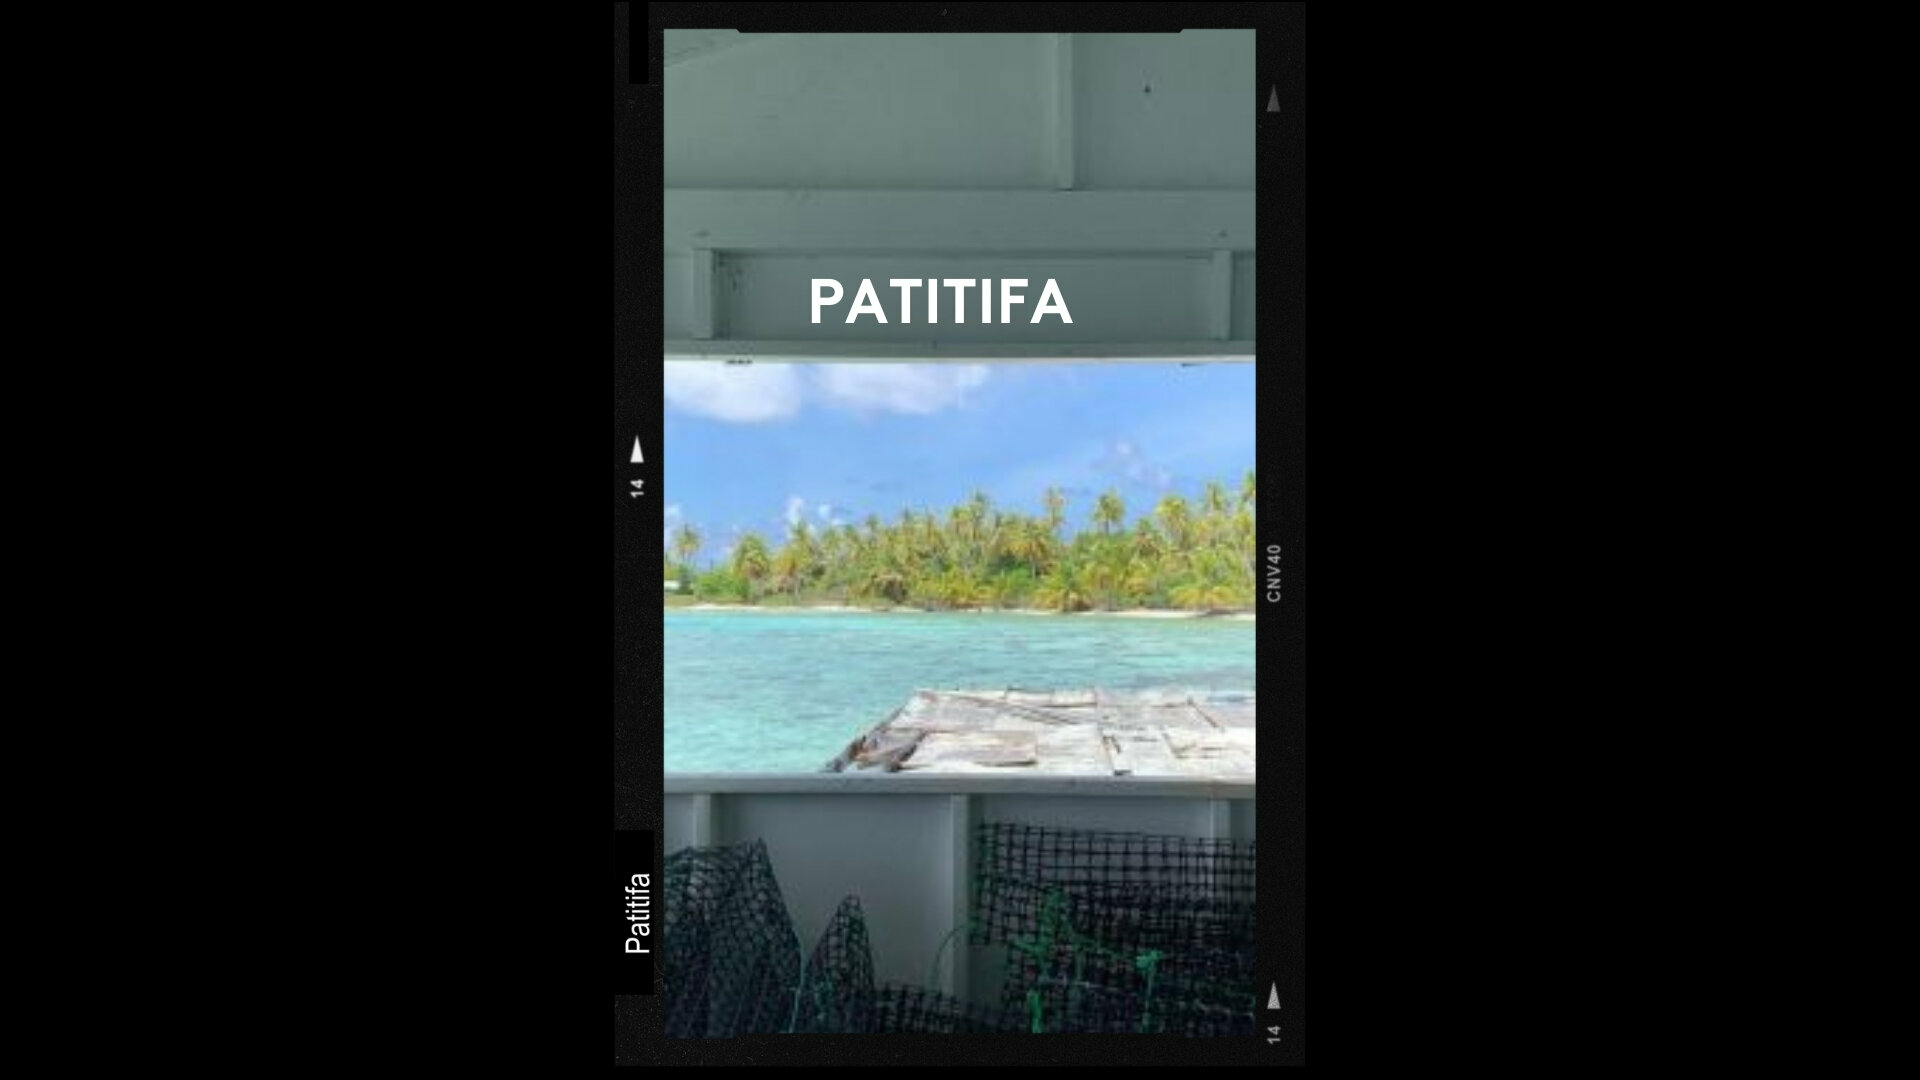 Patitifa : Plateau in